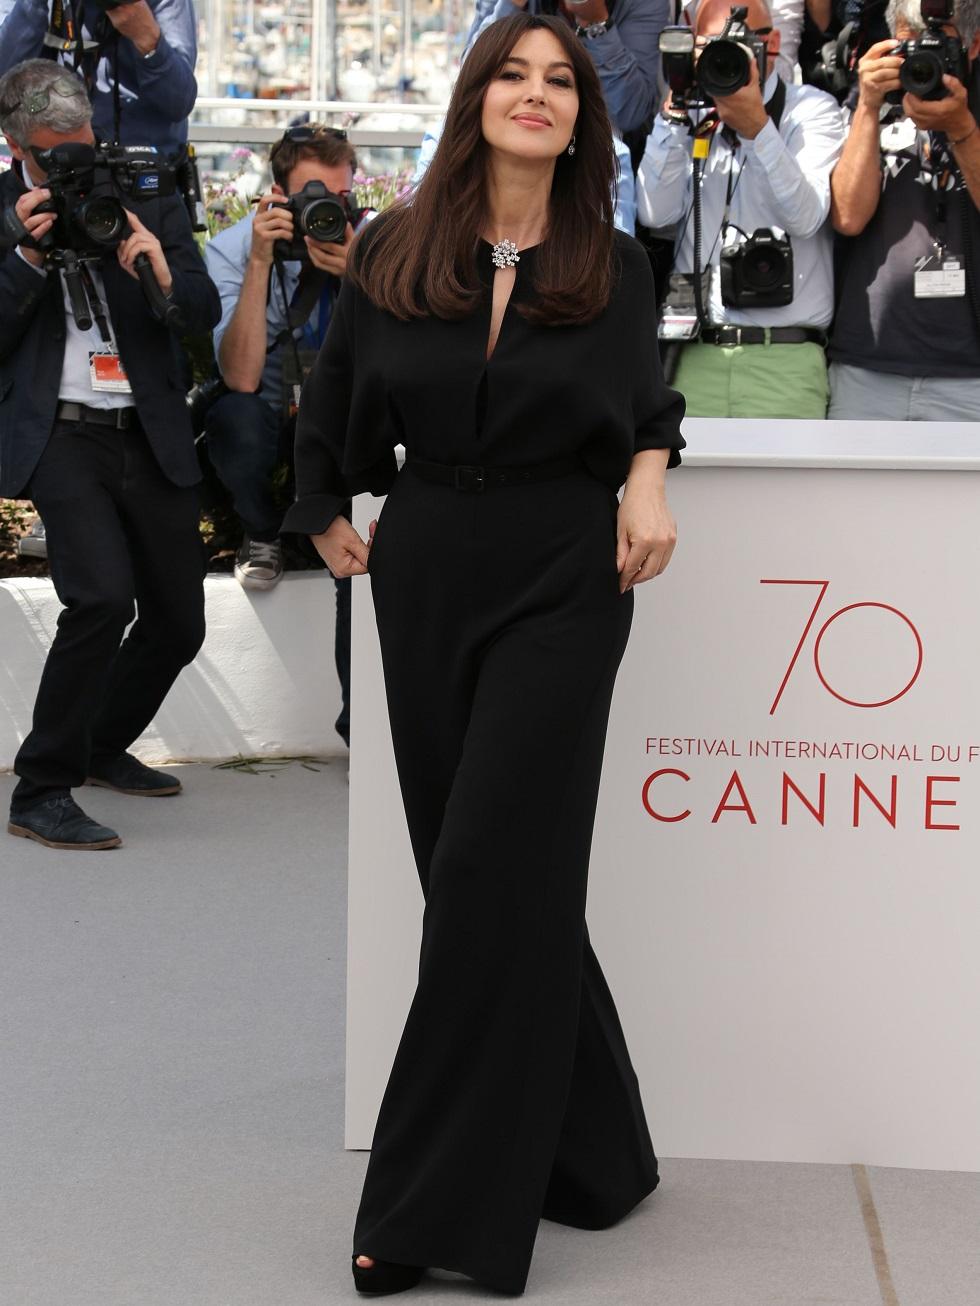 Cannes Monica Bellucci Photocall